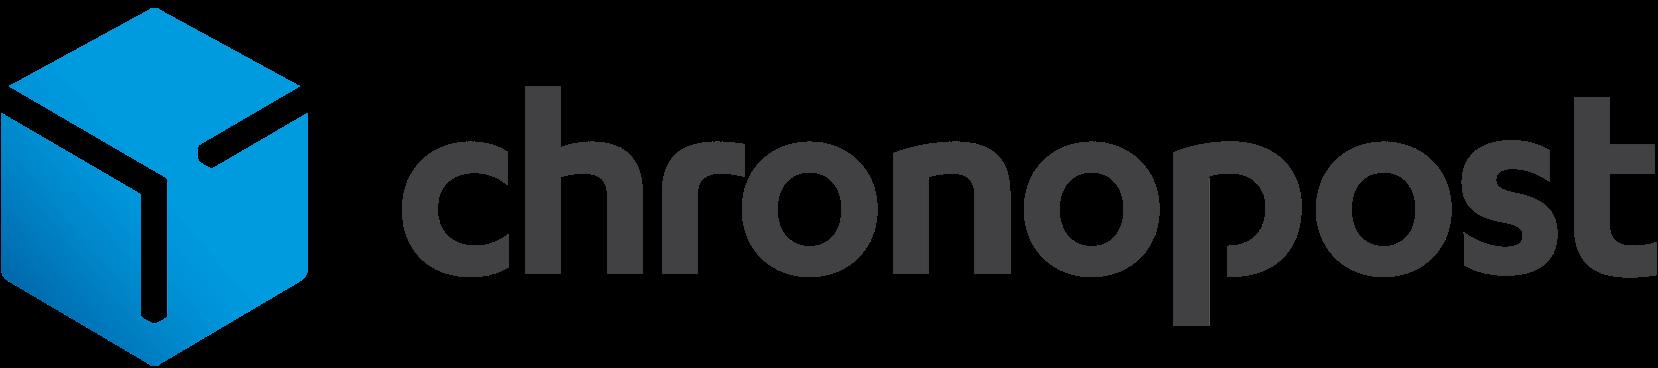 Chronopost logo 2015